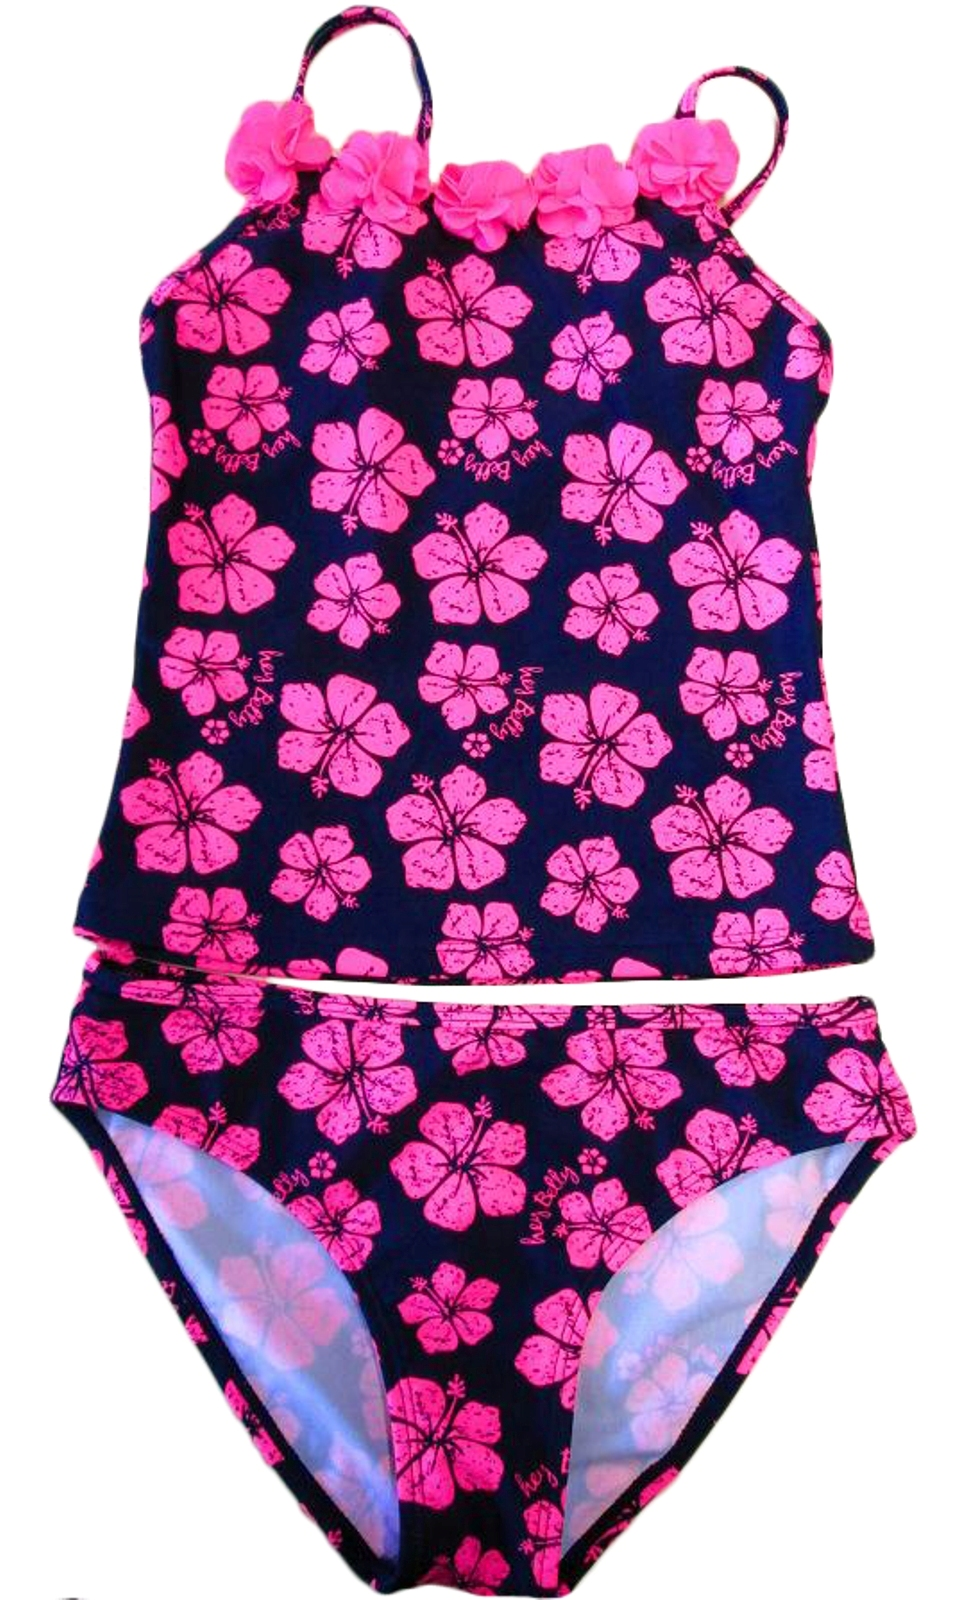 Ragazze Bambini Bimbi Set Bikini Costume Da Nuoto Tankini Estate Spiaggia 3-12 anni